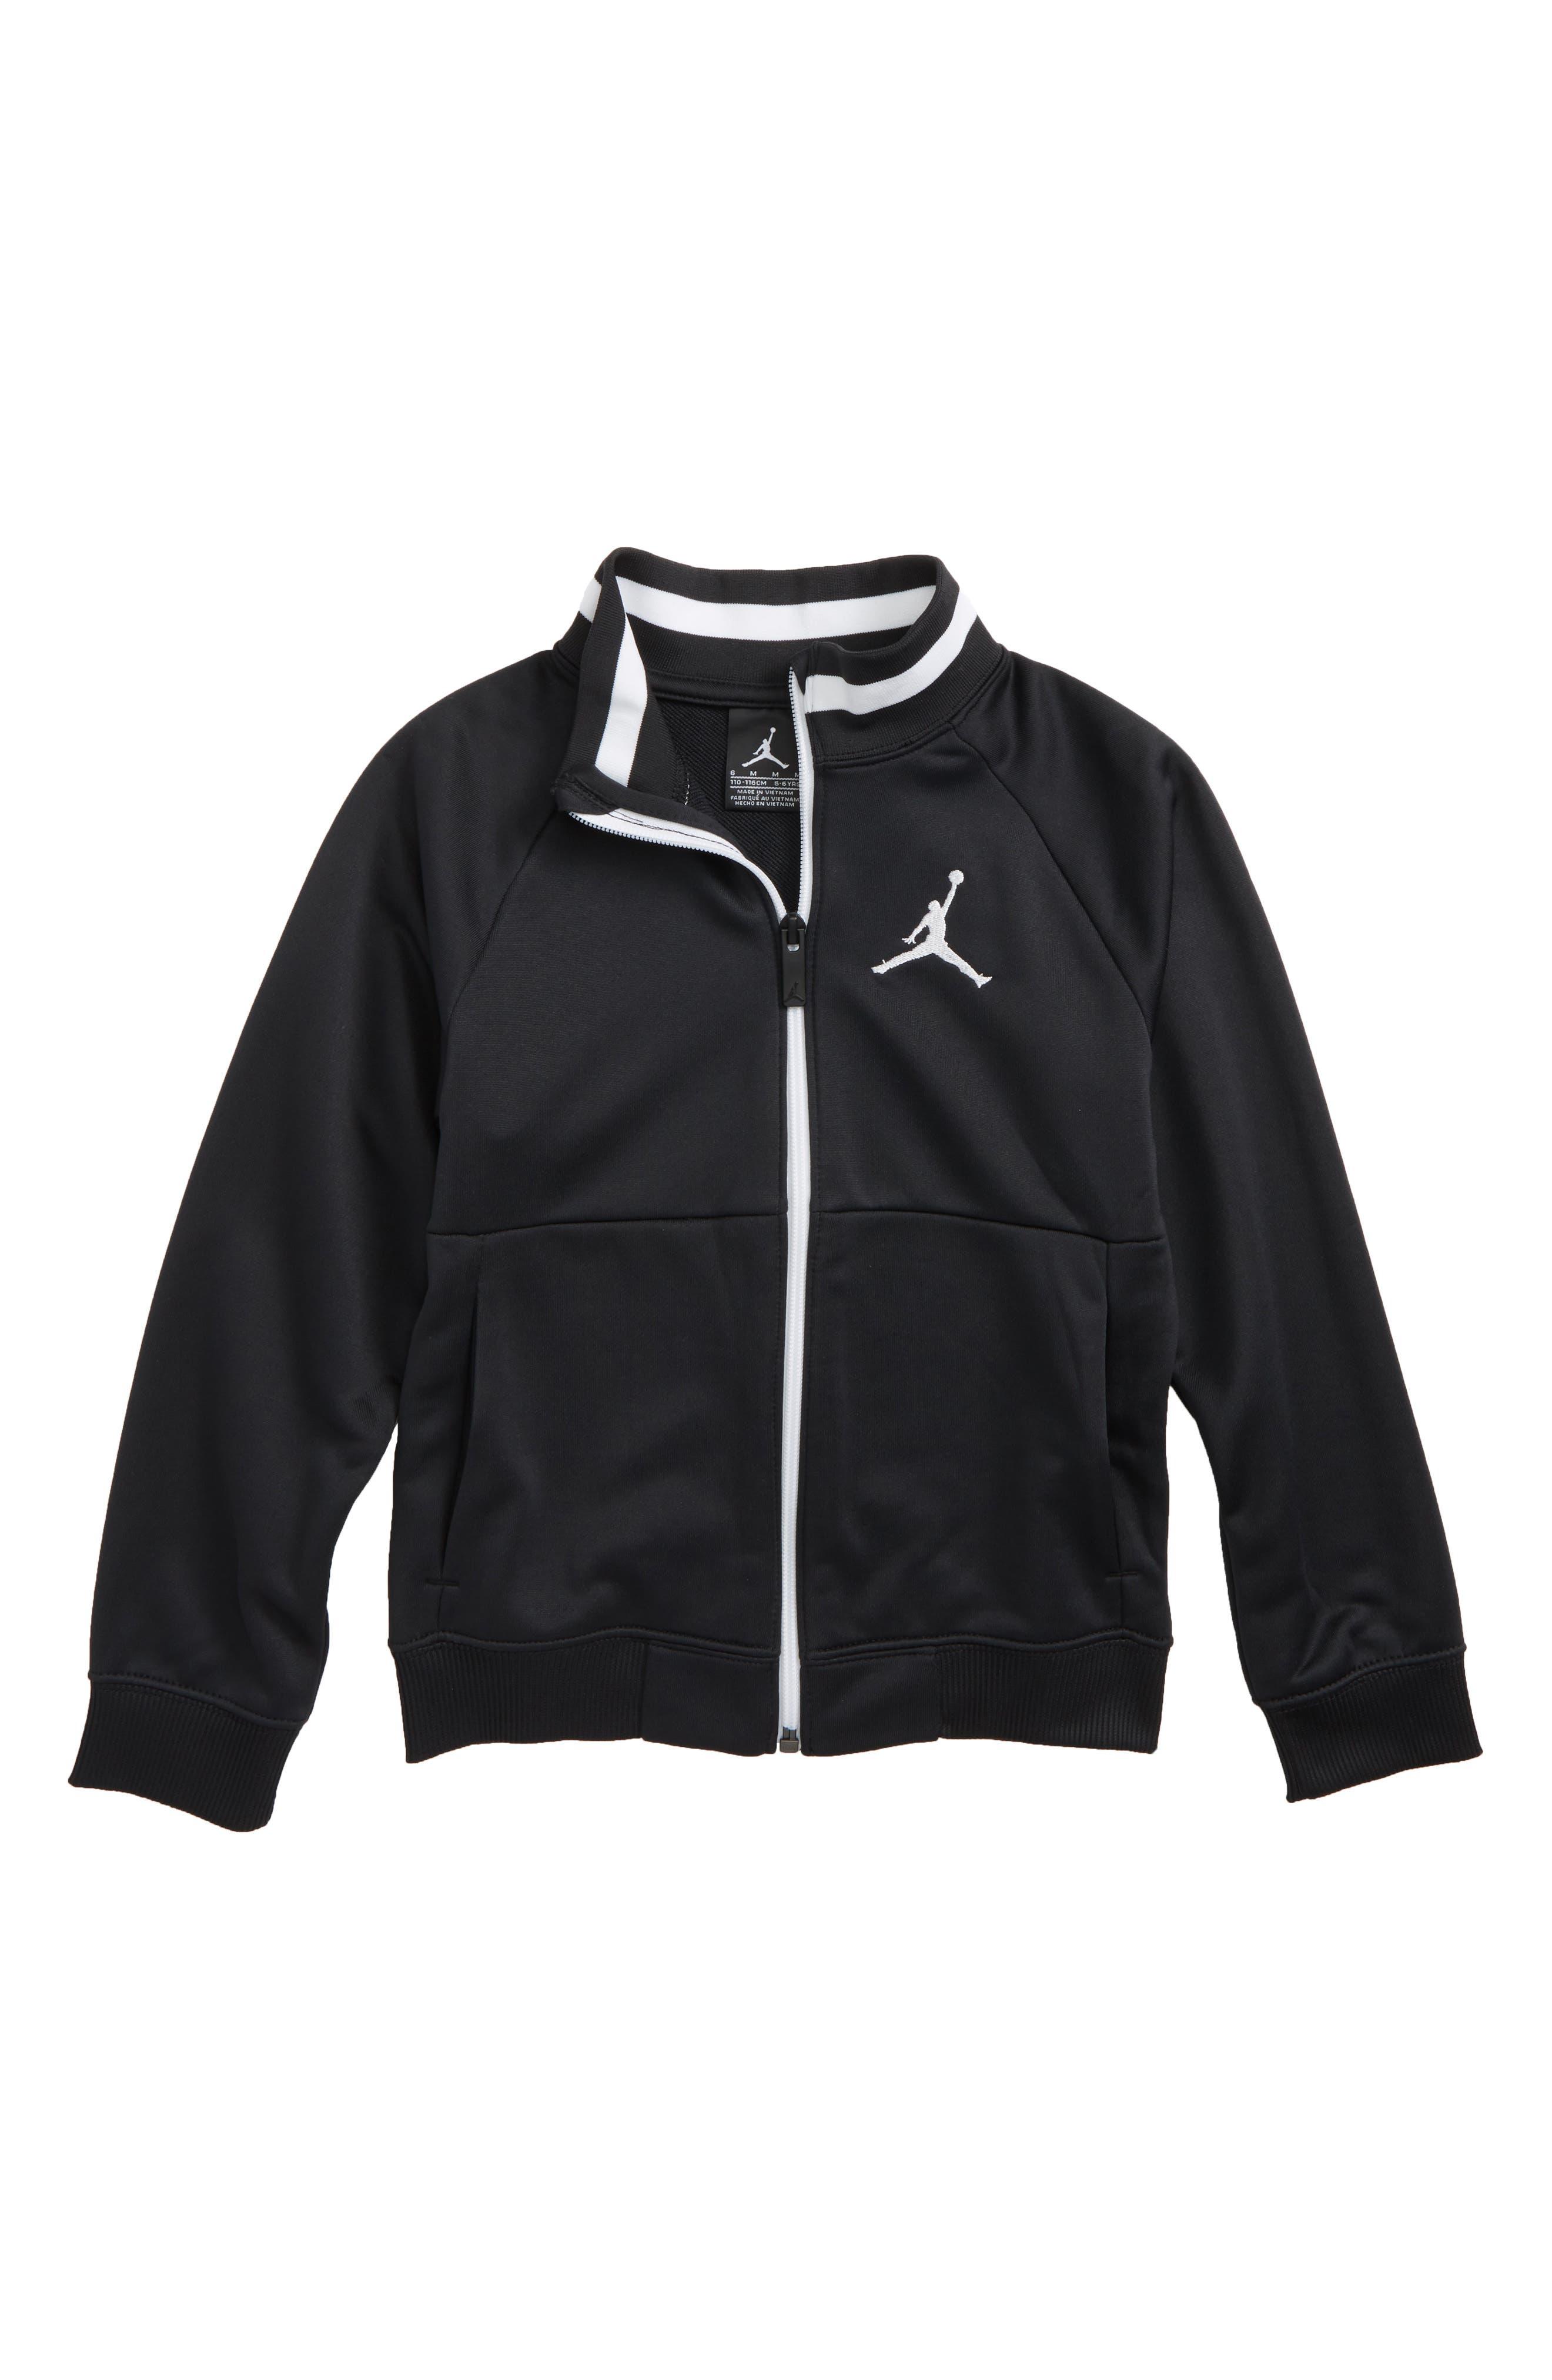 Jordan '90s Tricot Jacket,                         Main,                         color, 004